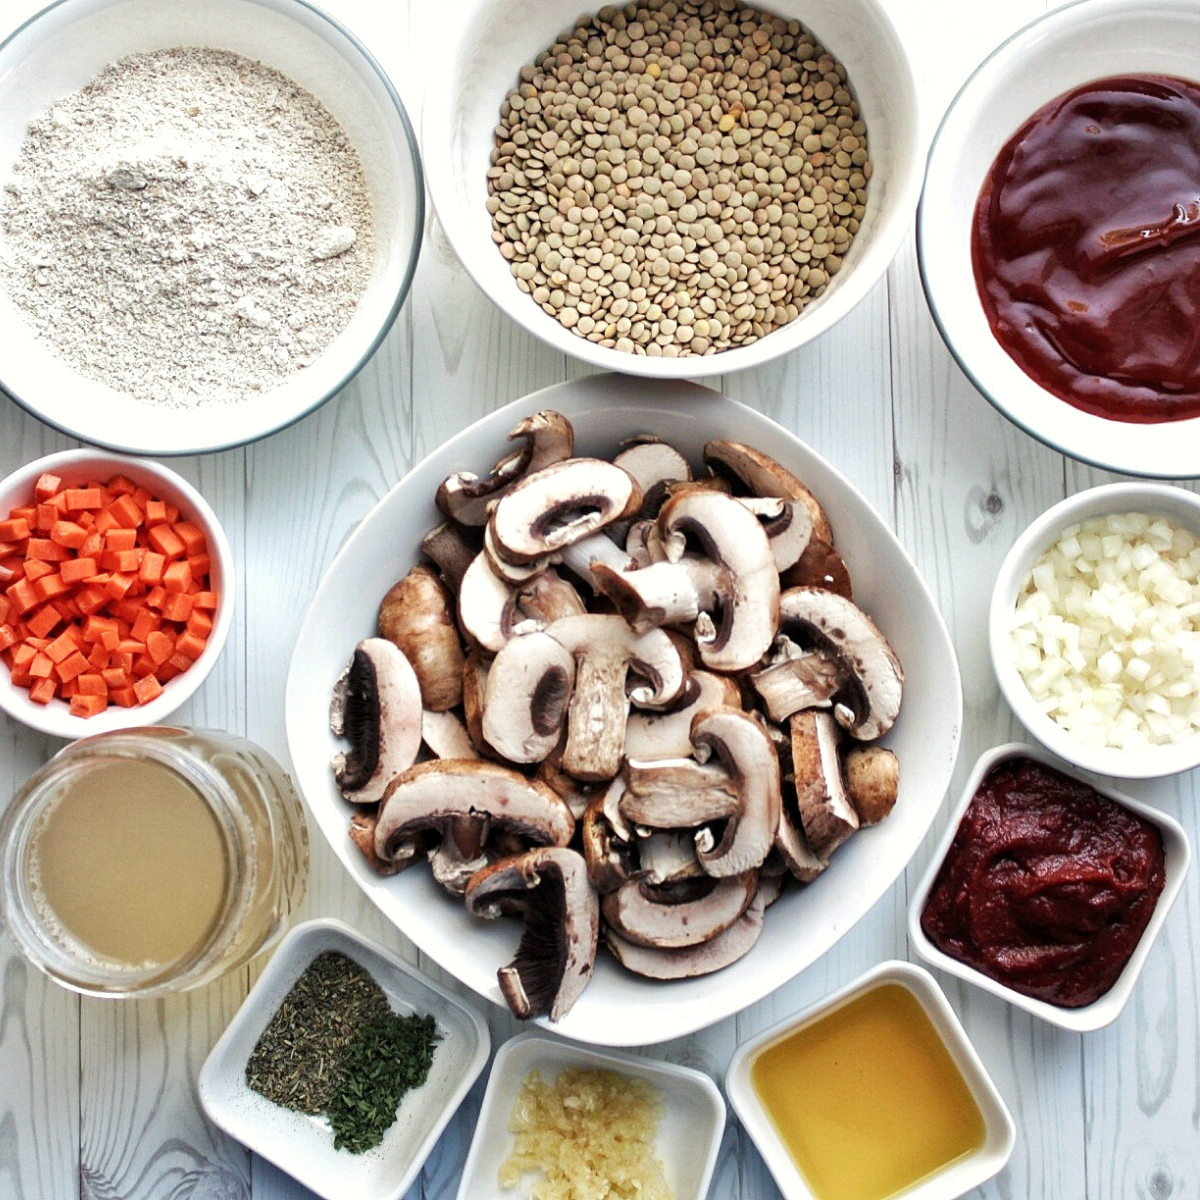 Dry lentils, glaze sauce, chopped onion, carrots, mushroom, mushroom broth, Italian seasoning, dried parsley, crushed garlic, olive oil, glaze, sauce, and oat flour - each in small bowls.